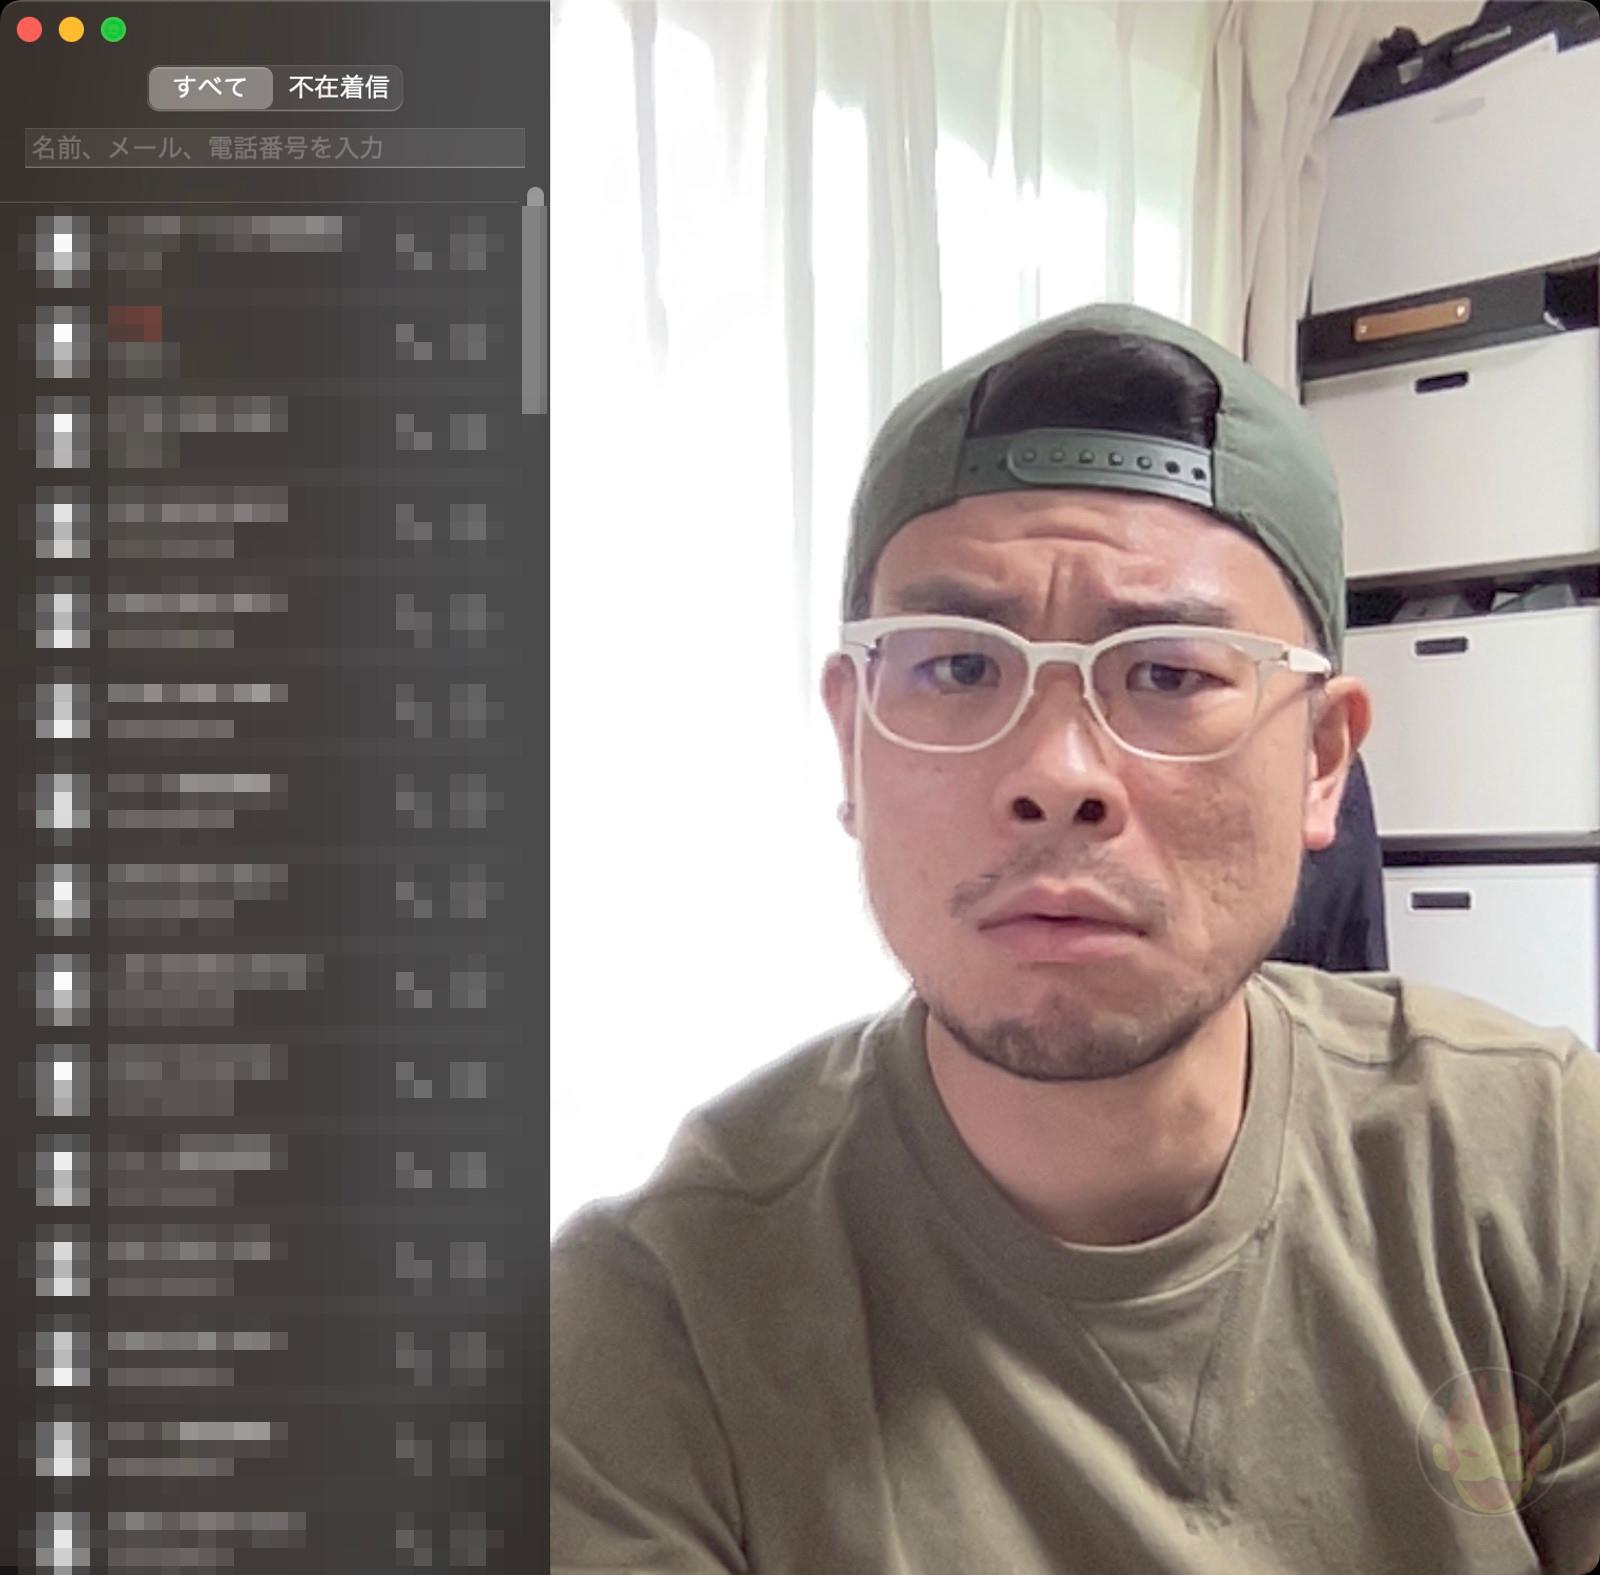 FaceTime Camera with FaceTime App 1